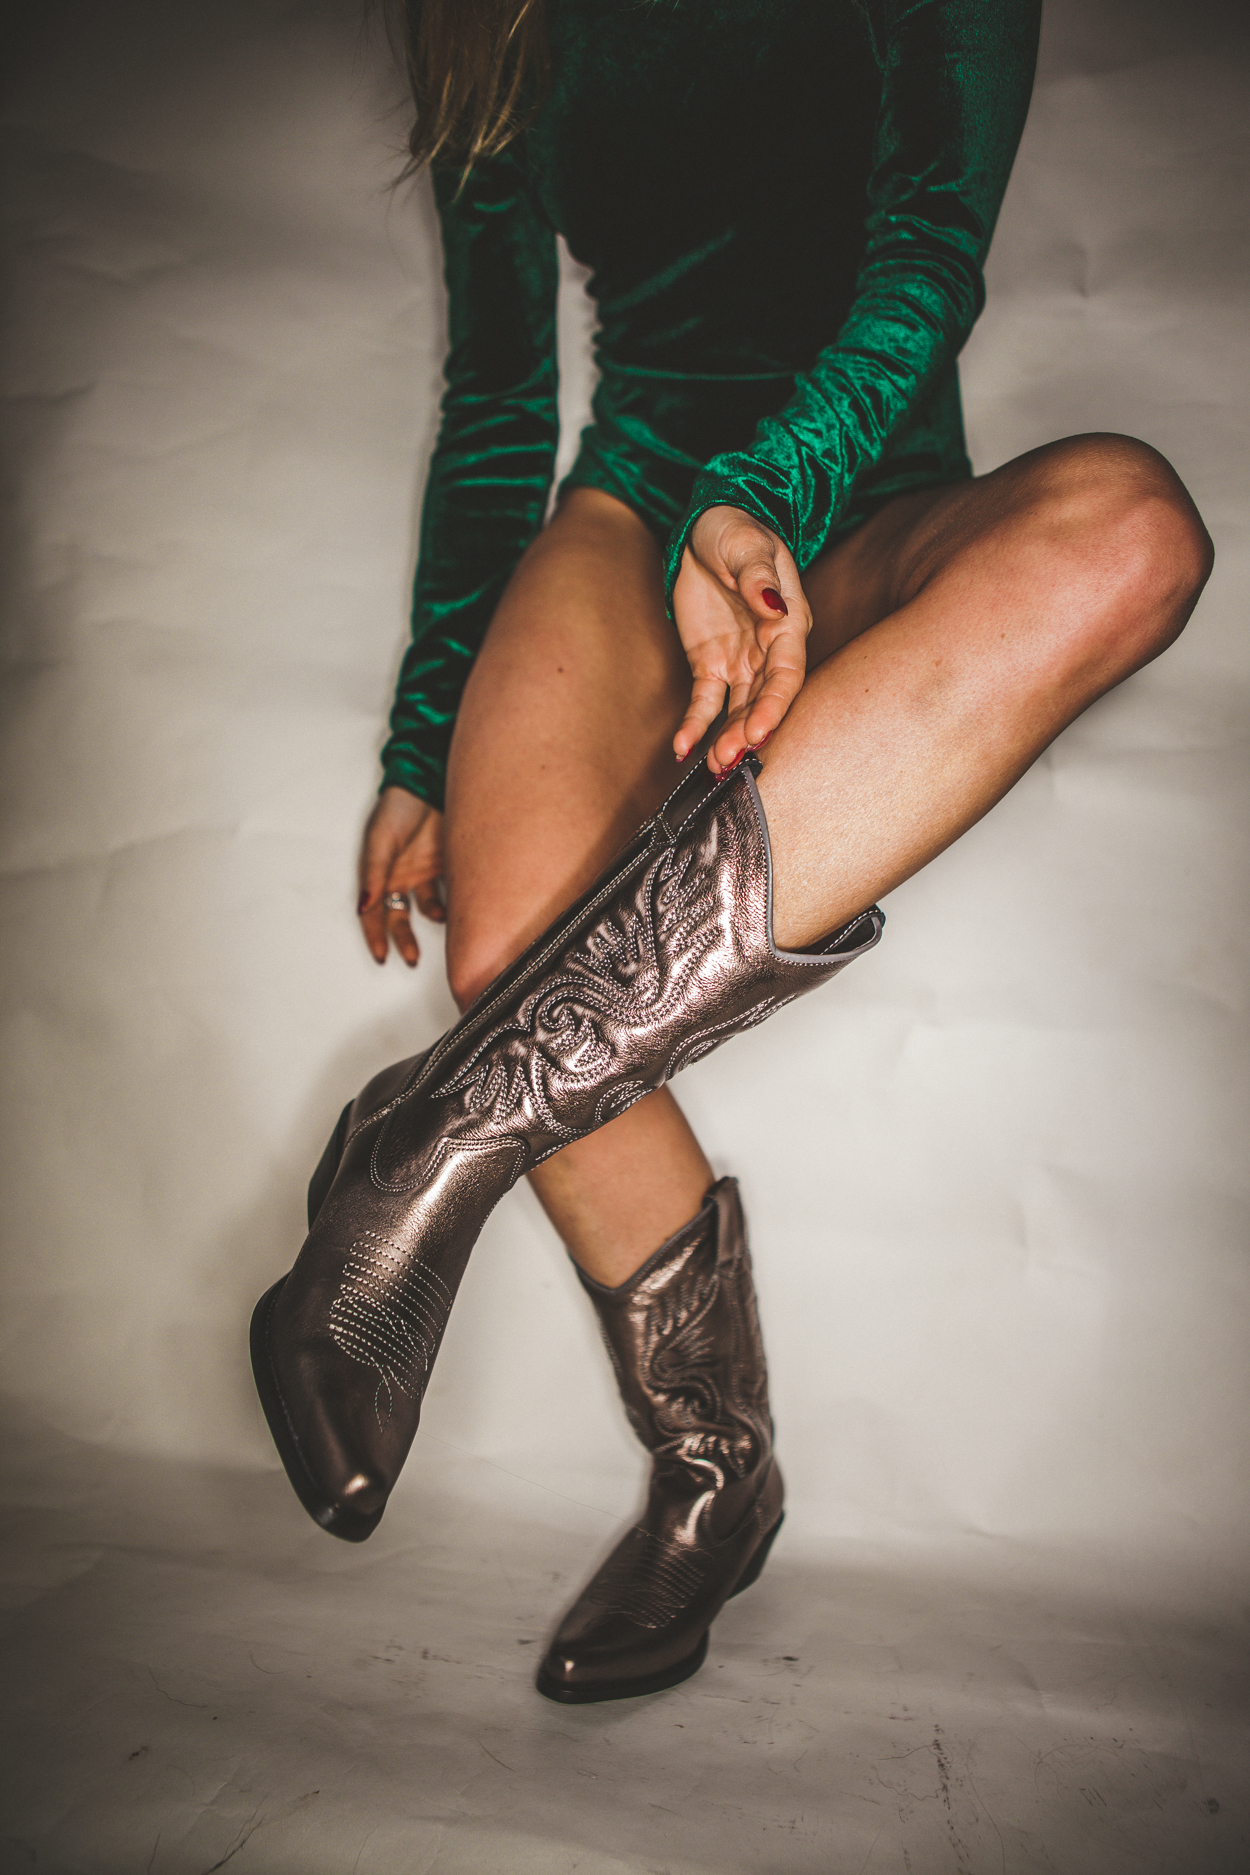 so-cee-blog-lifestyle-carmen-heystek-so-jamie-shoes-schoenen-amsterdam-tilburg-gezond-balans-dieet-outfit-kerst-laarsjes-glutenvrij-recept-7